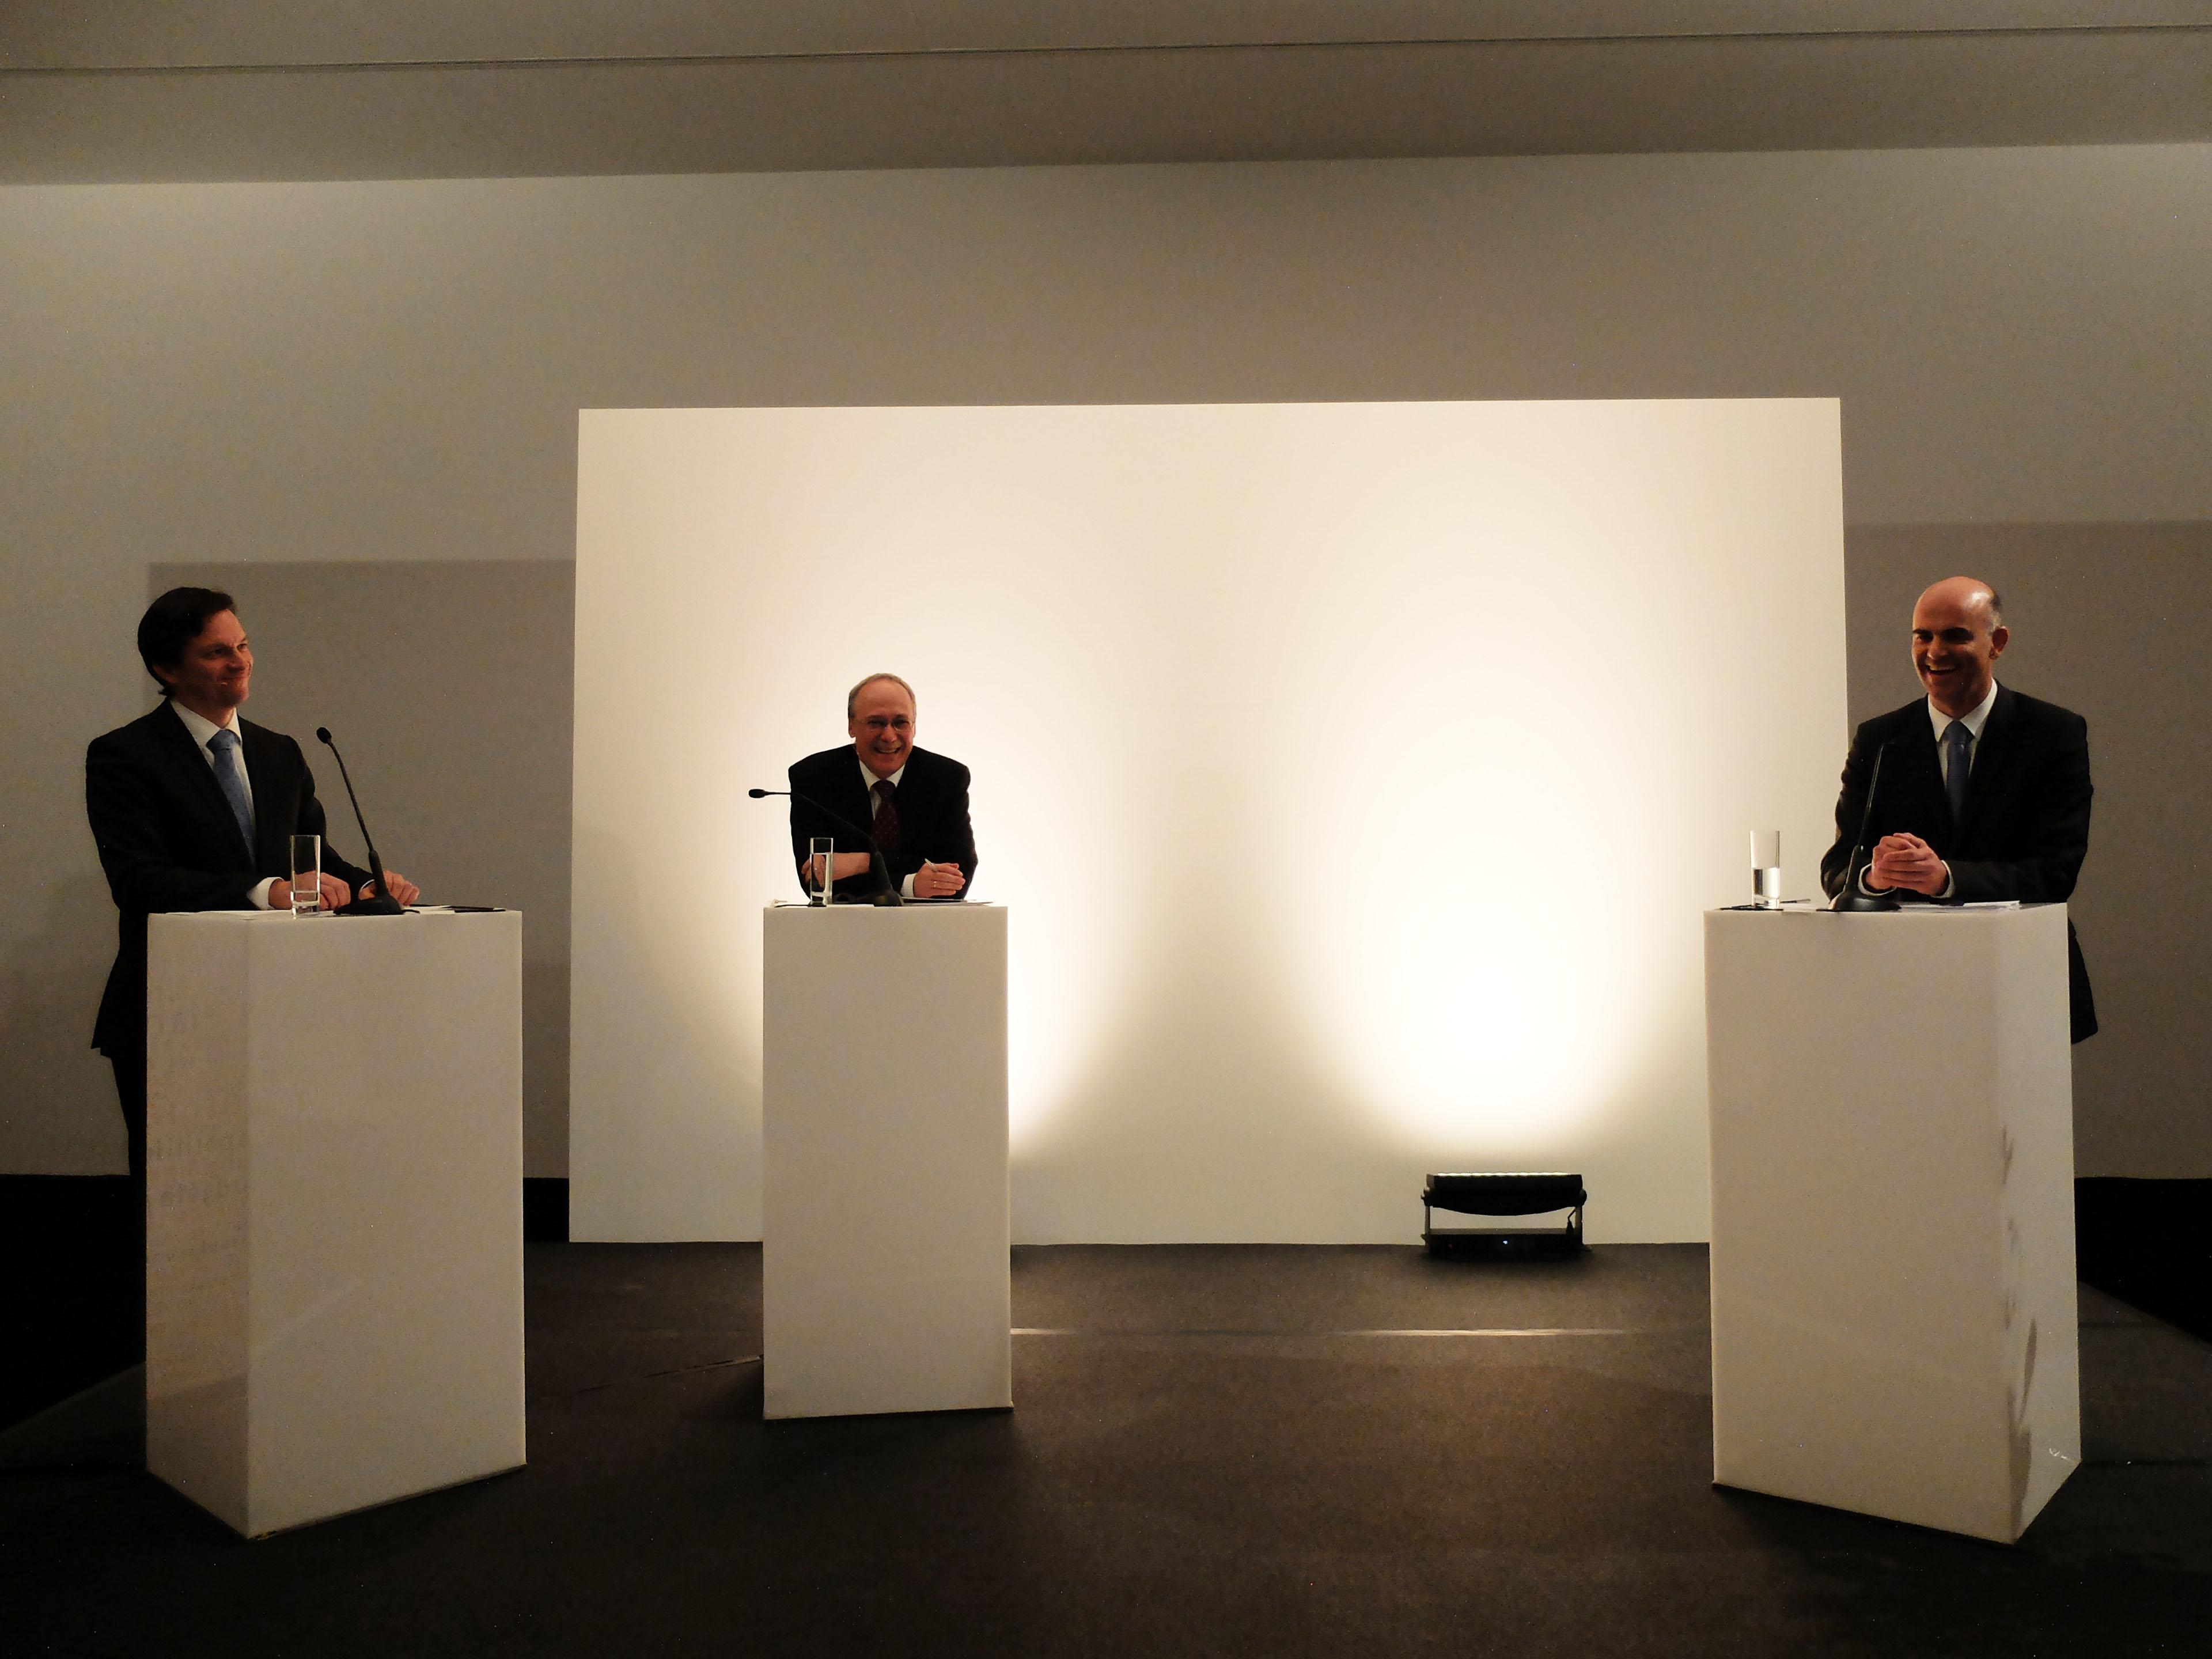 Jérôme Cosandey, Gerhard Schwarz et Alain Berset